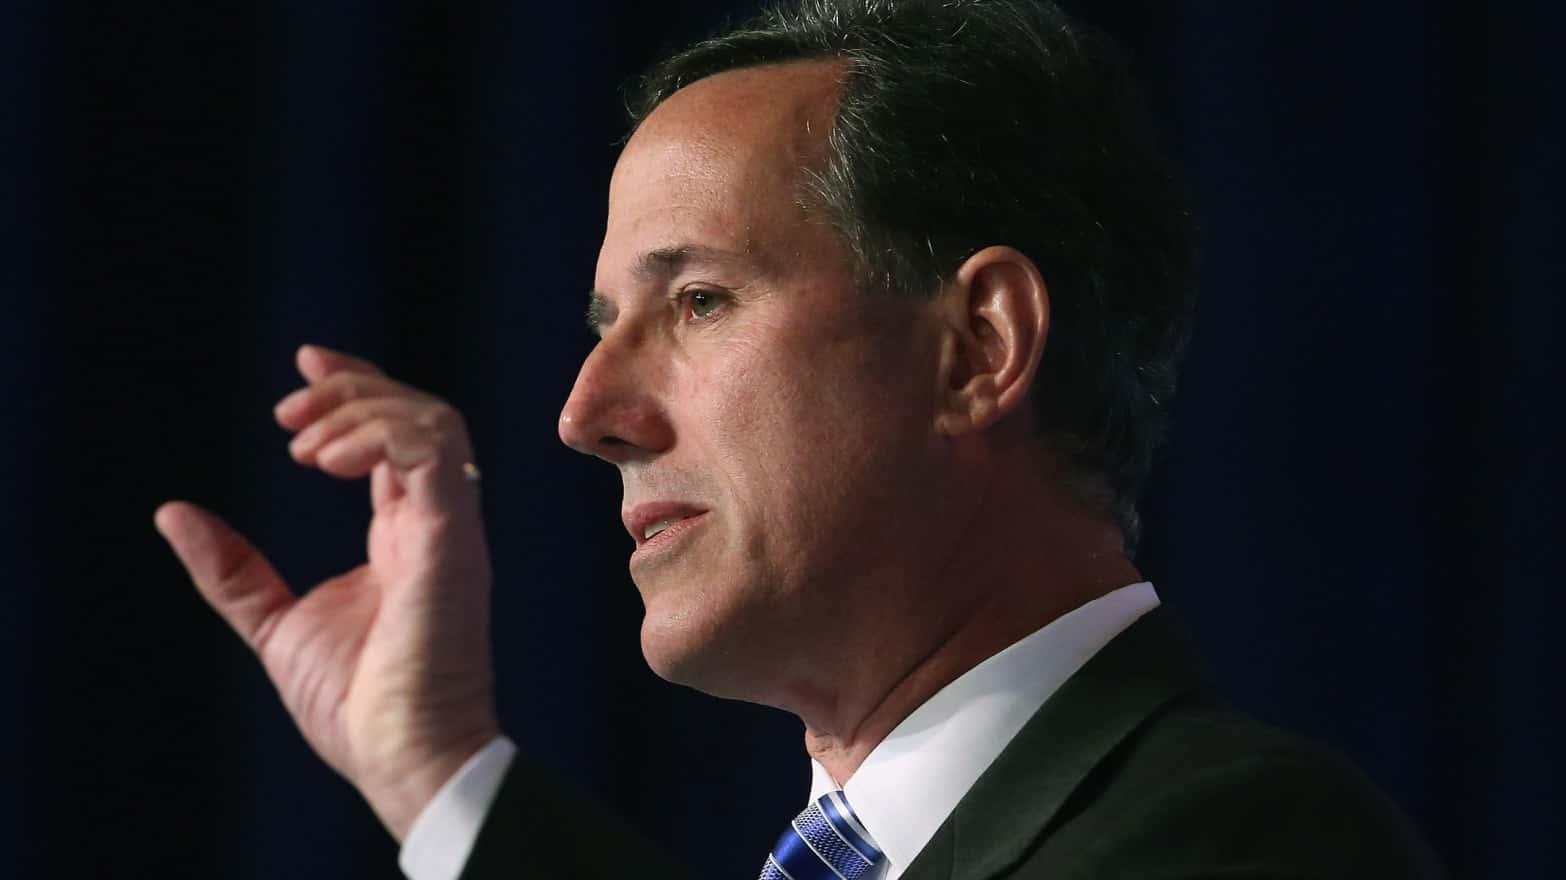 Rick Santorum Islam Is Not A Religion, It's A Political Movement